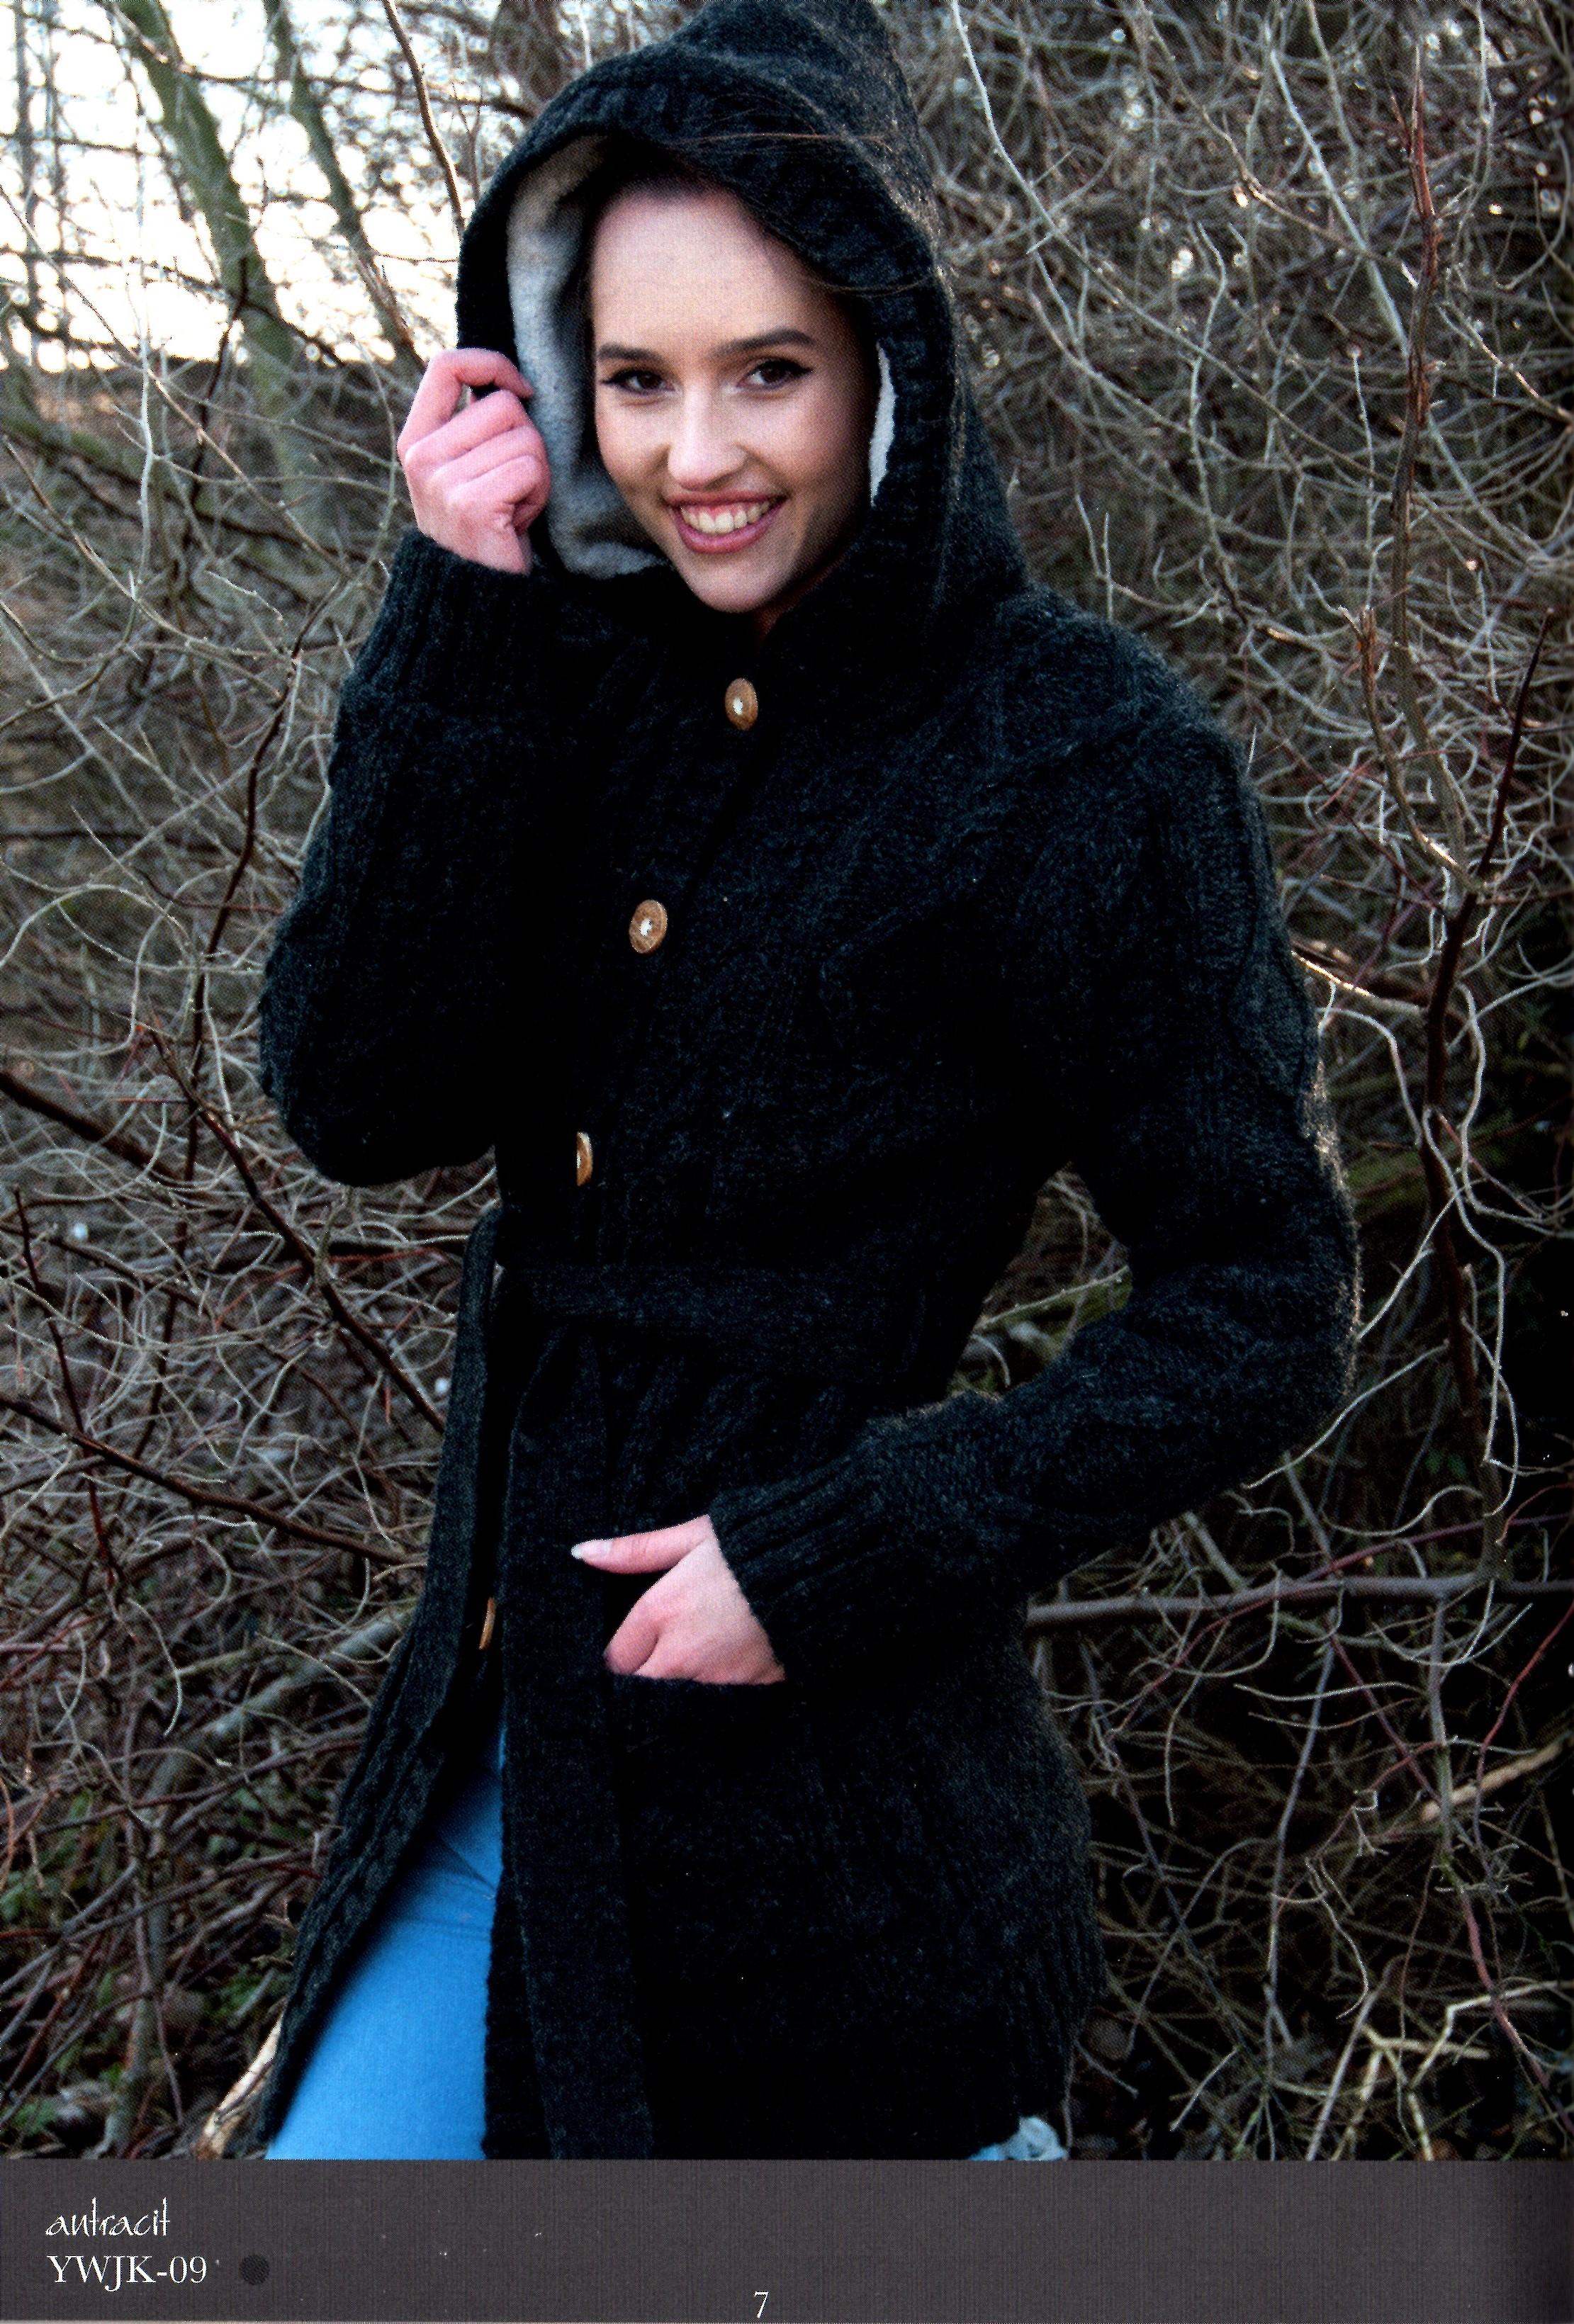 Wintercollectie 2015 Pure clothing